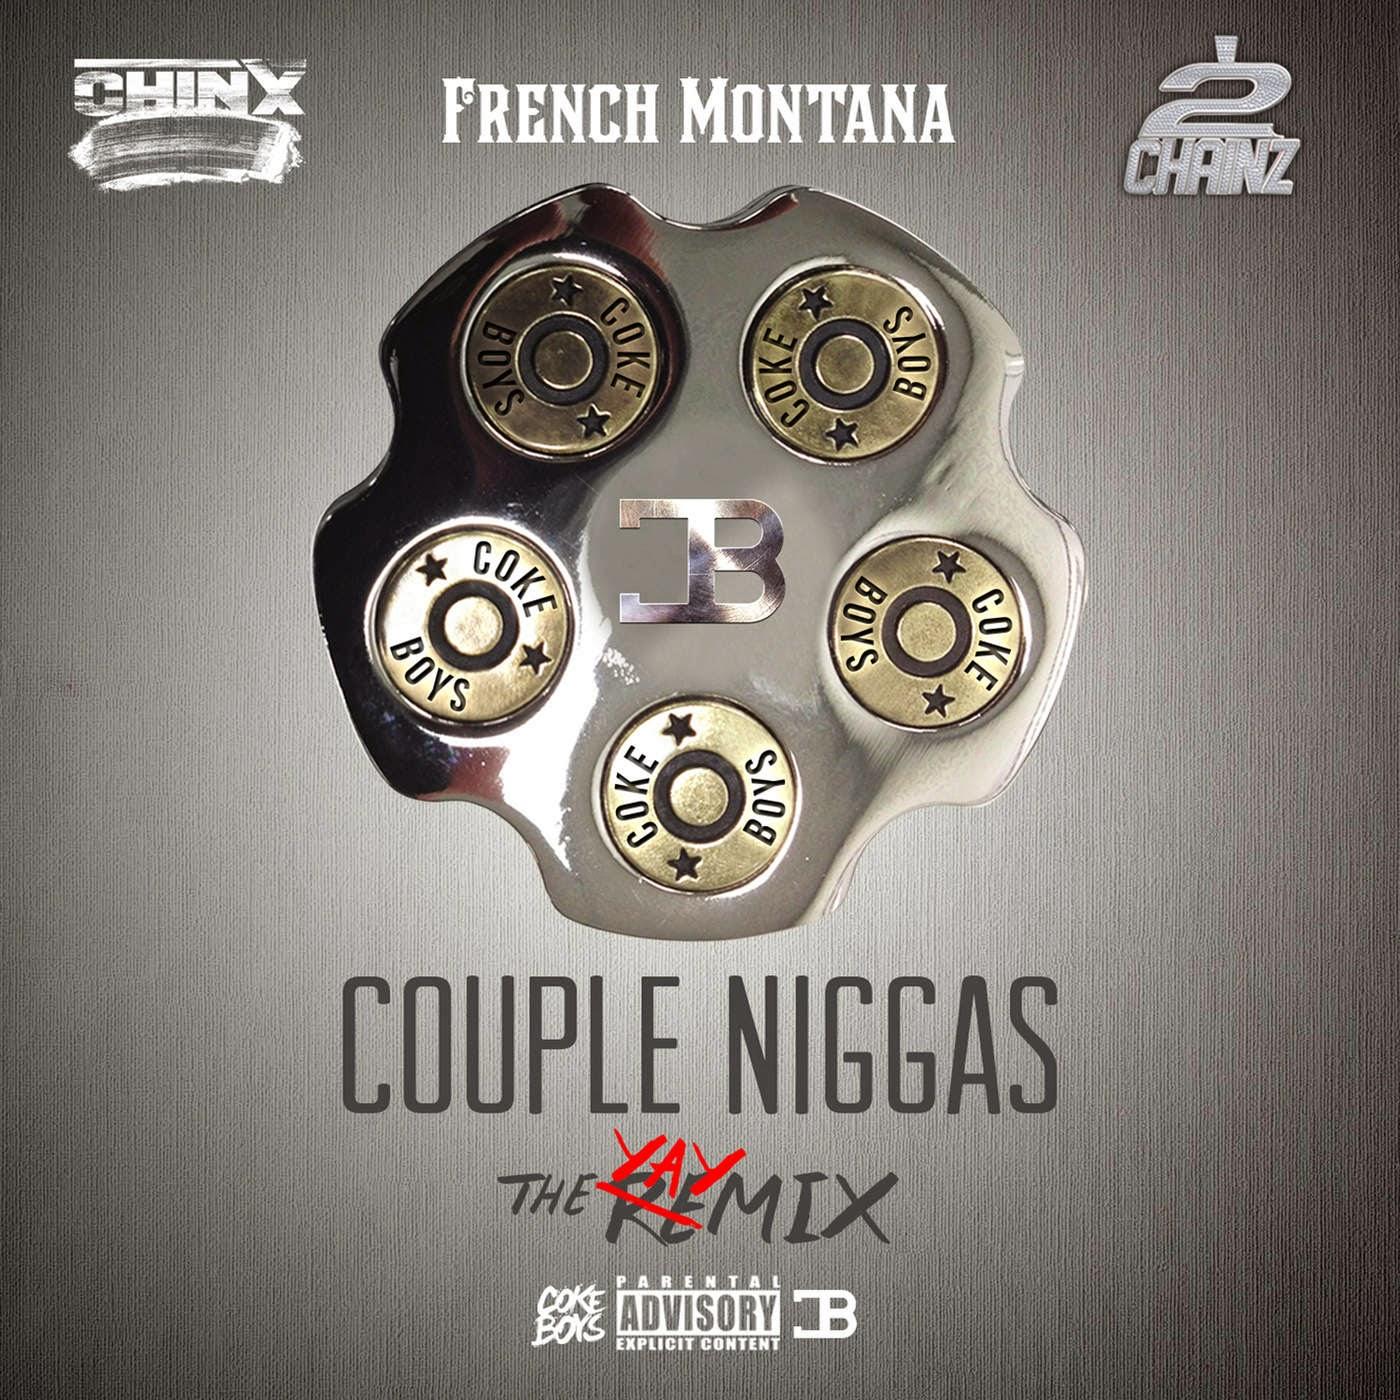 Chinx - Couple Niggaz Remix (feat. 2 Chainz & French Montana) - Single Cover